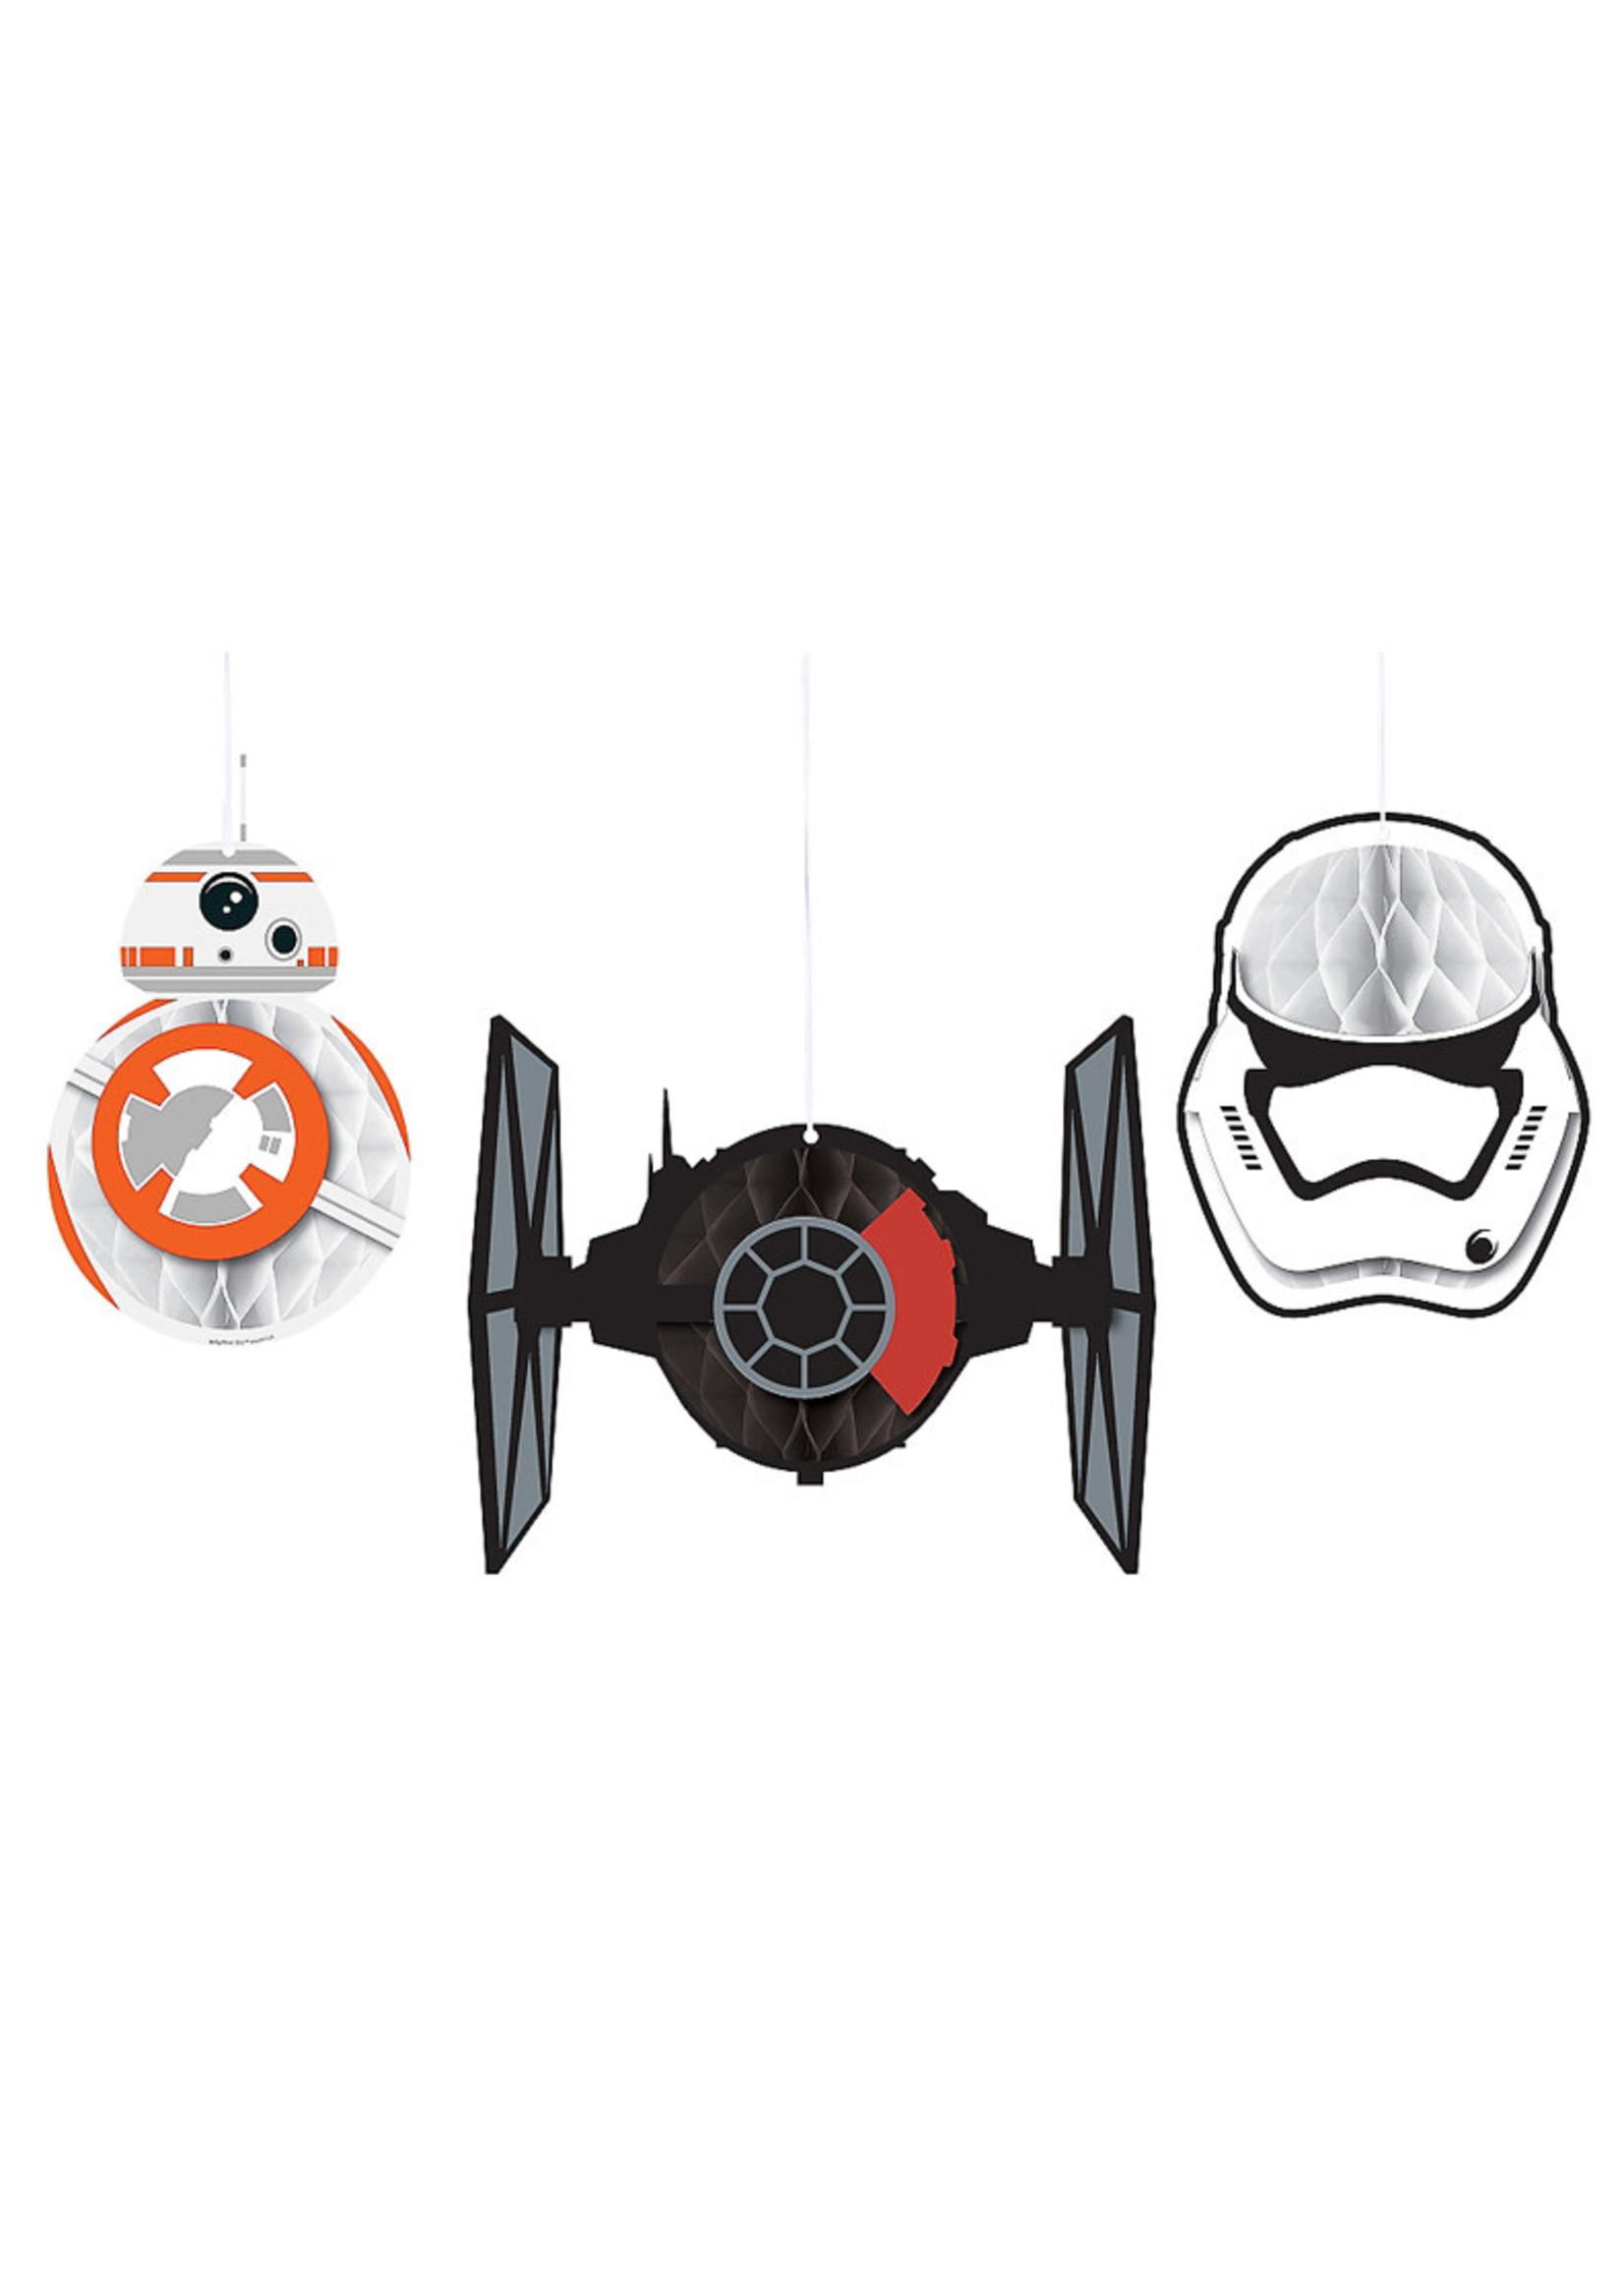 Star Wars - The Force Awakens Honeycomb Balls 3ct